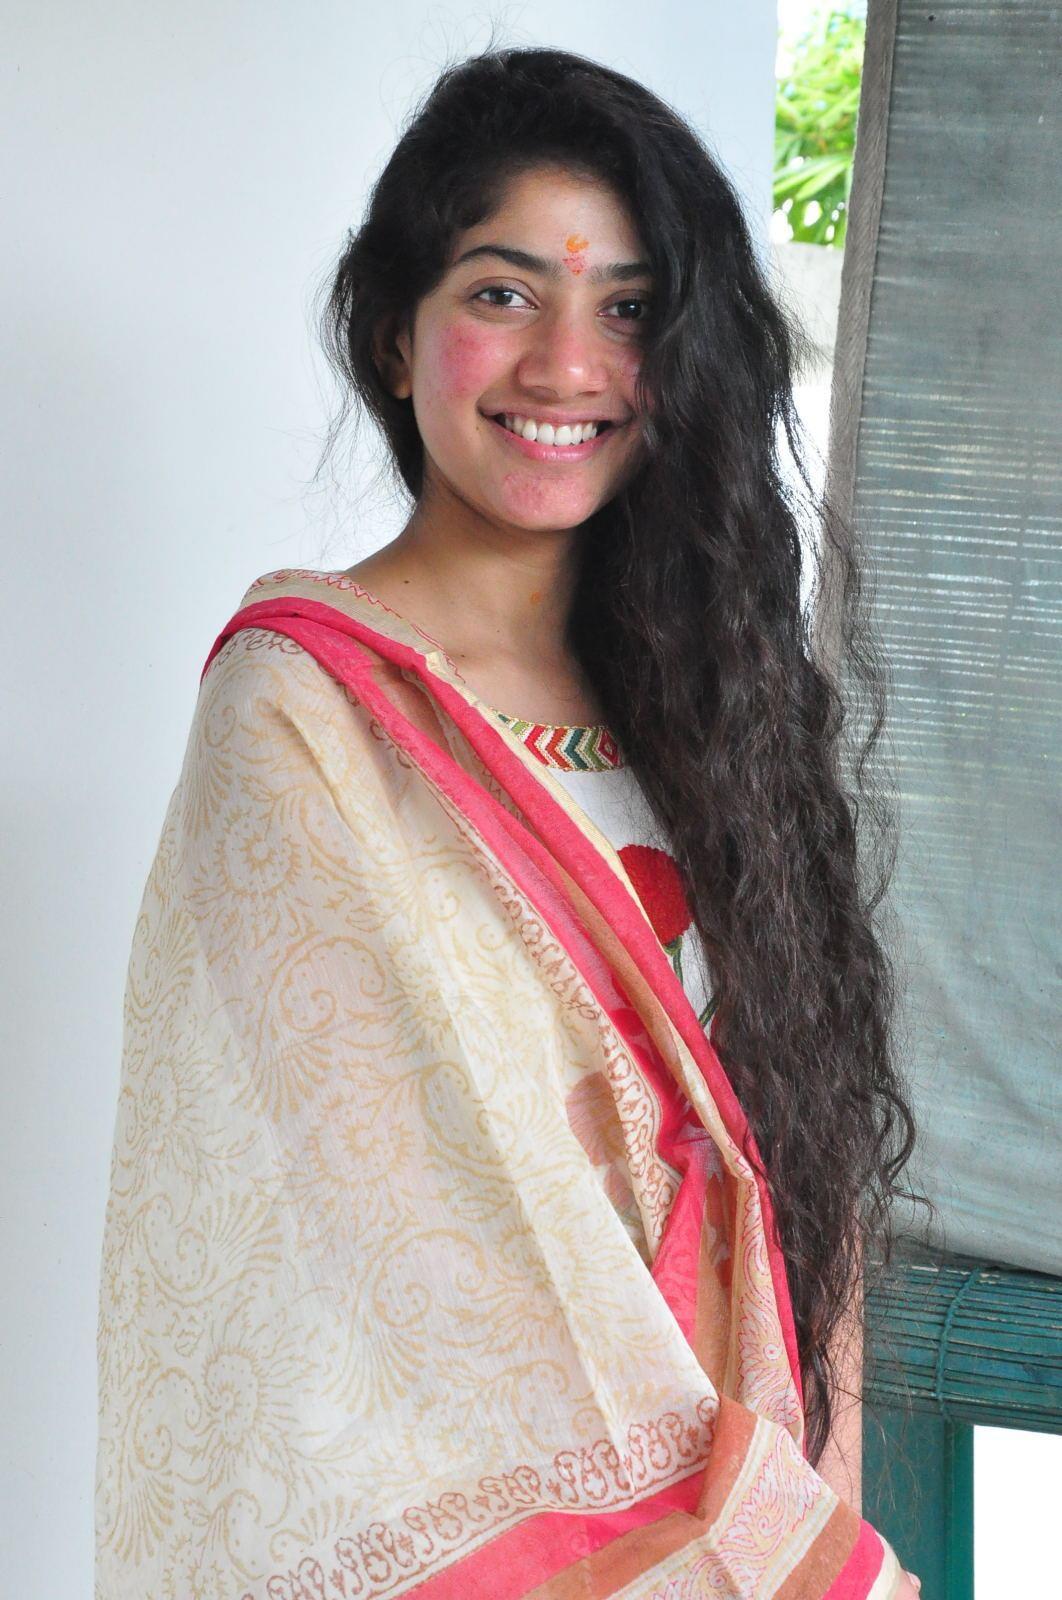 sai pallavi smiling stills at fidaa movie launch in white dress sekhar kammula movie fidaa actress sai pallavi photos premam movie fame sai pallavi hd